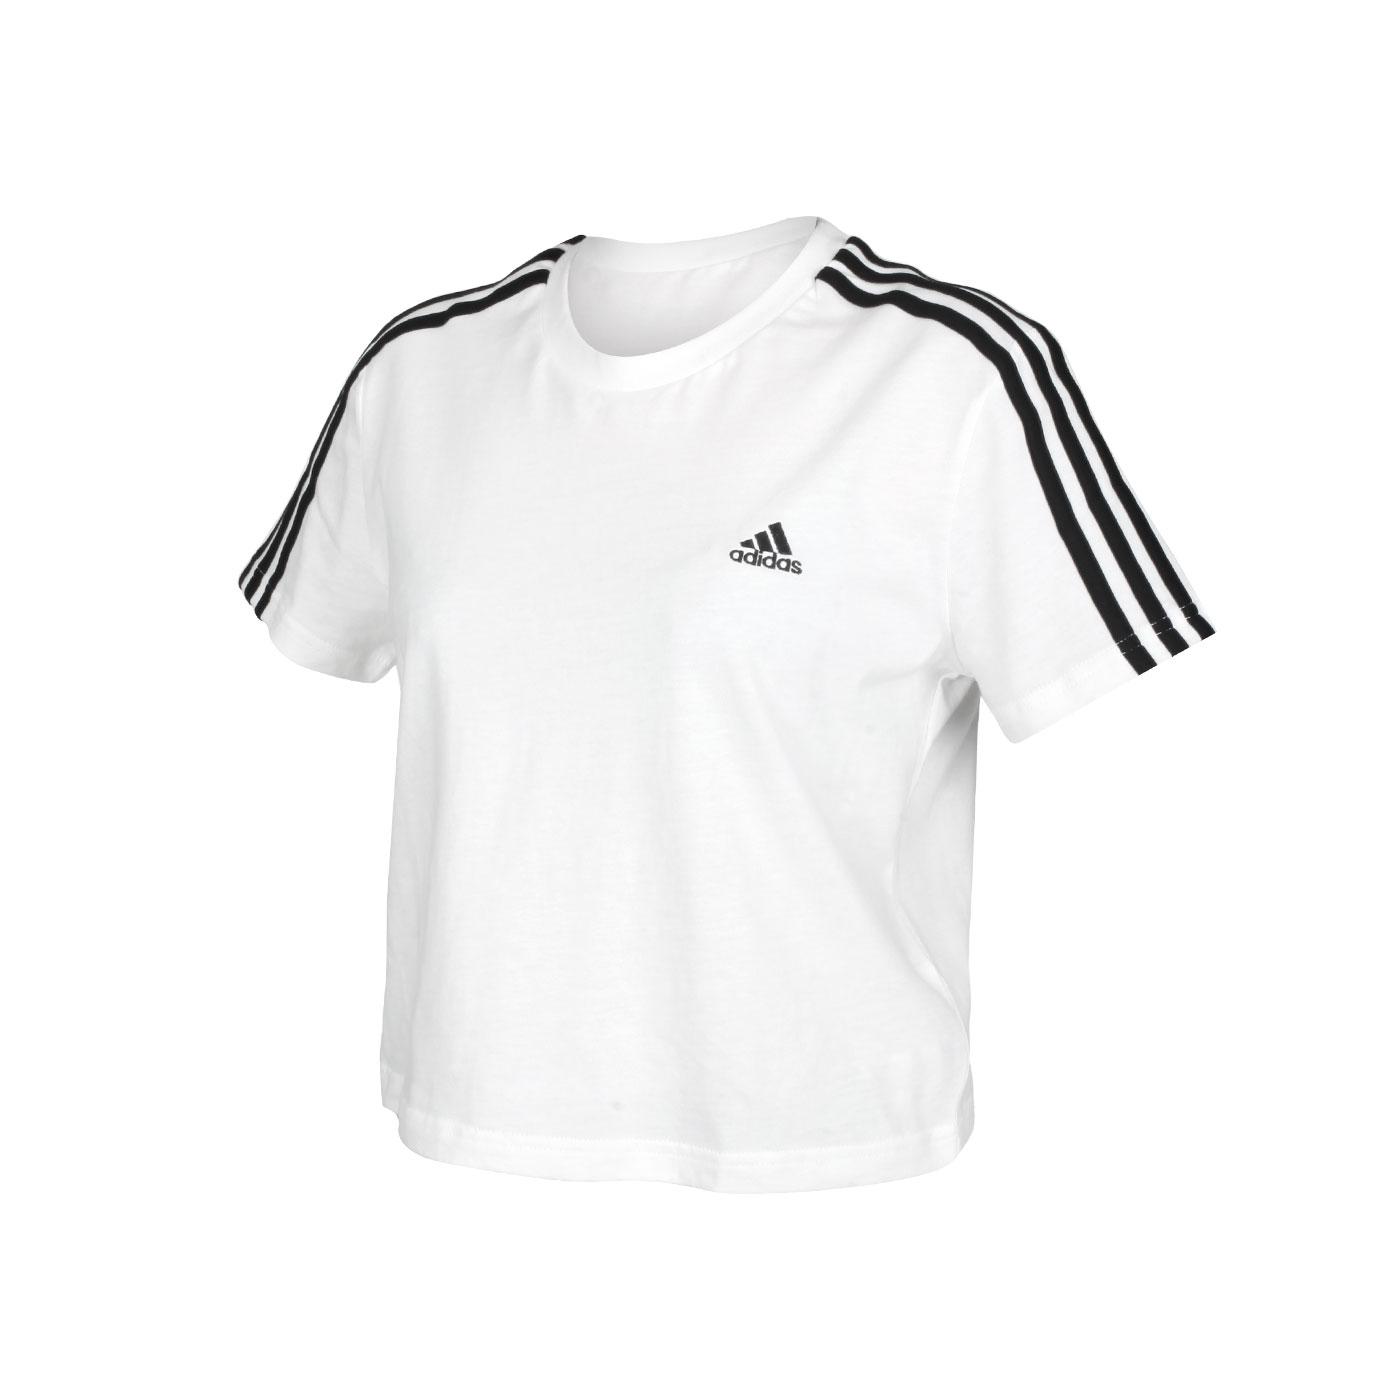 ADIDAS 女款短袖T恤 GL0778 - 白黑